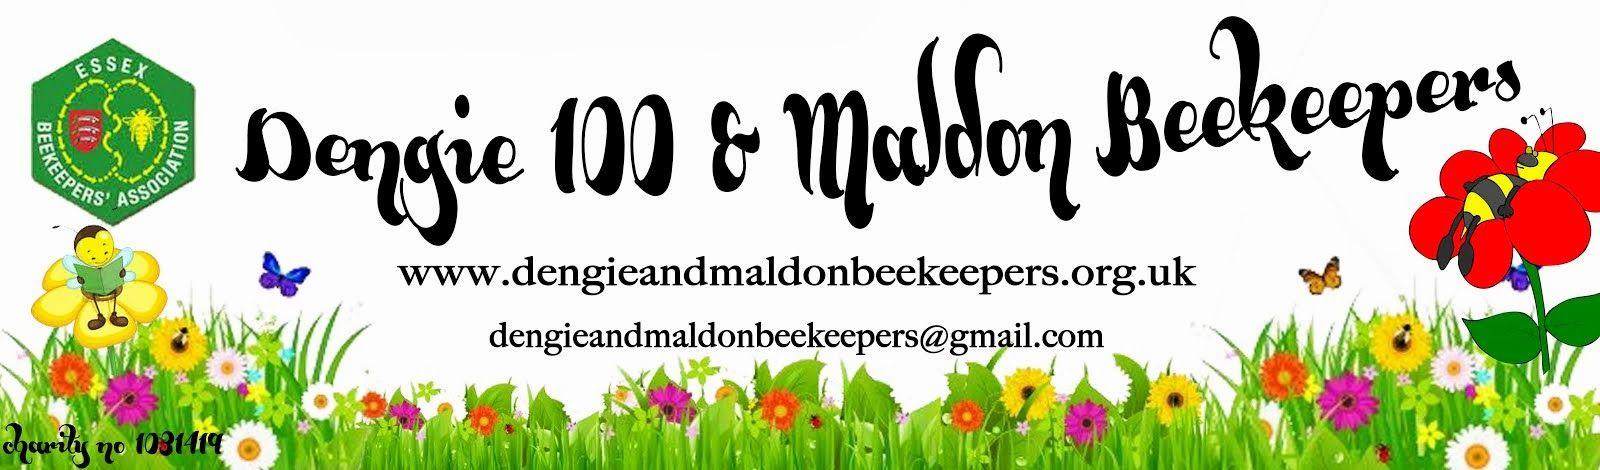 For all things beekeeping in Maldon - www.dmbka.org.uk